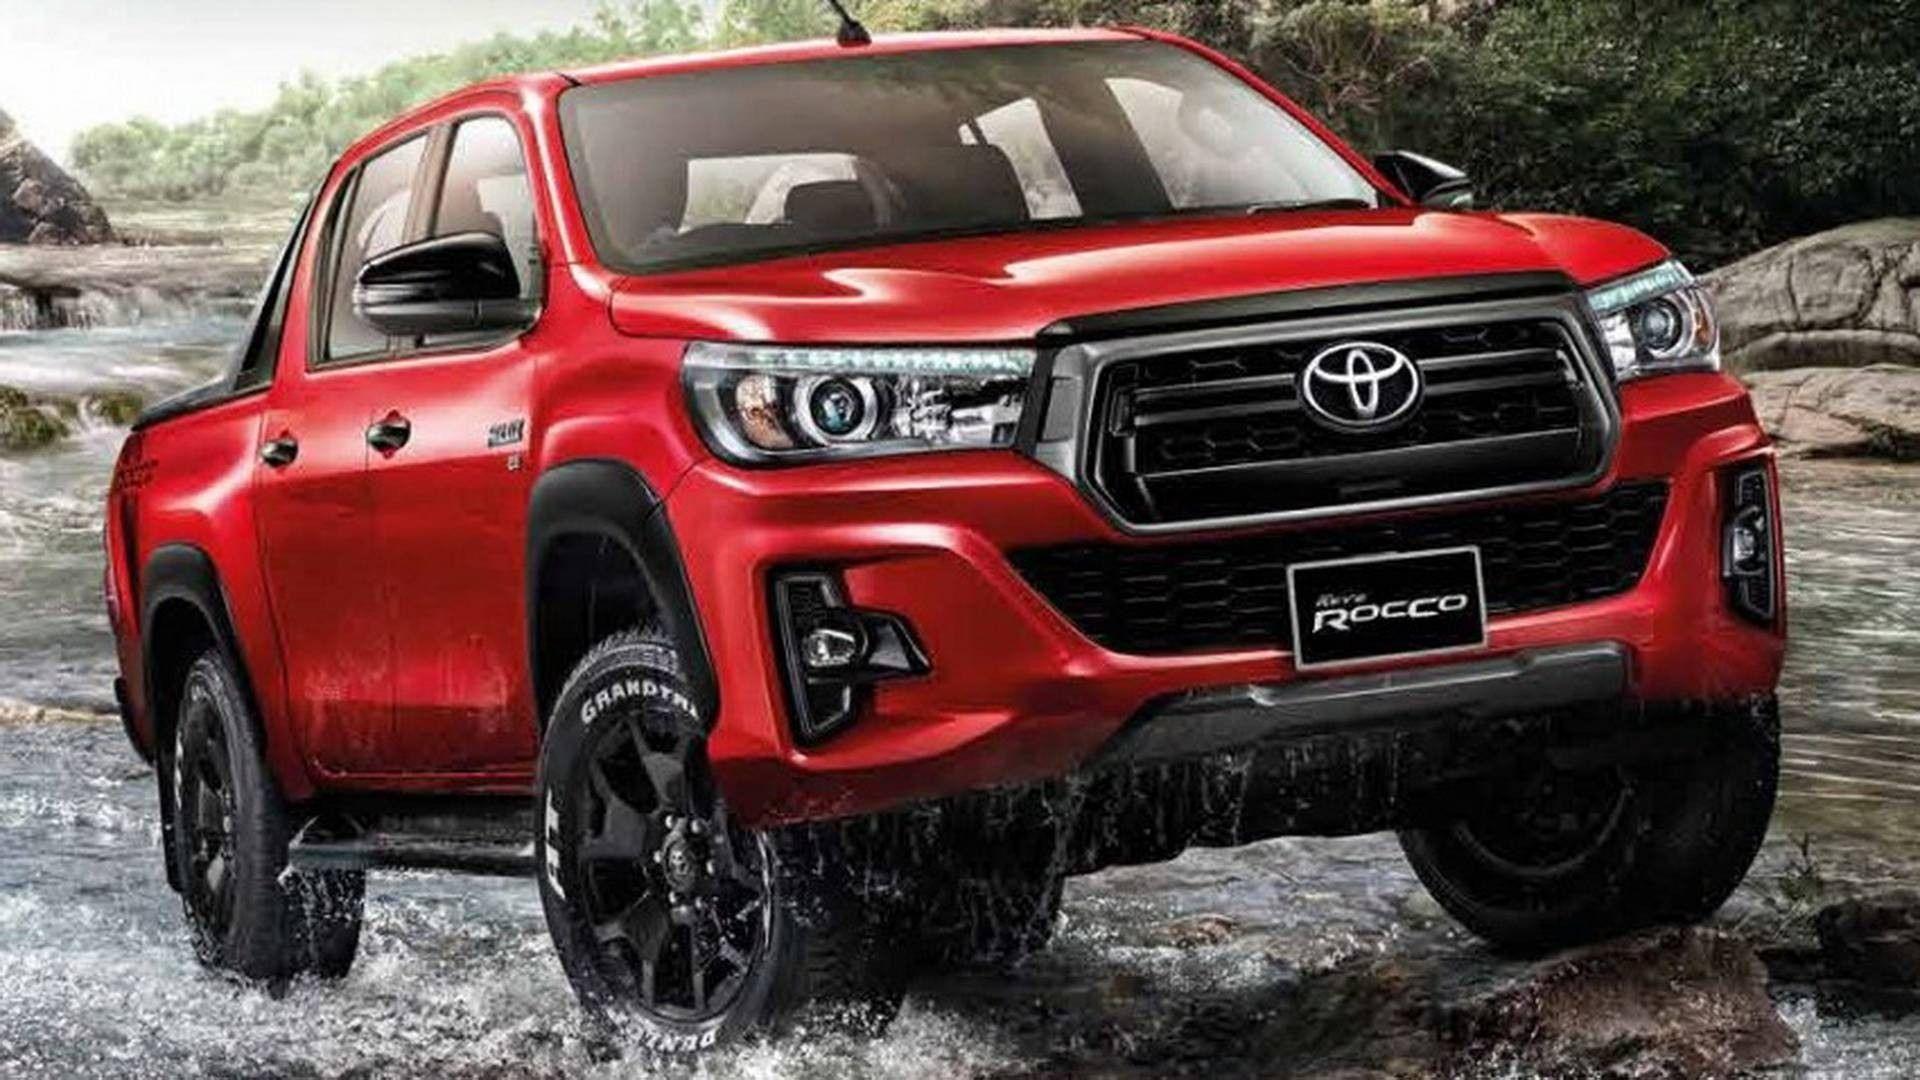 2019 Toyota Dakar Interior Car Review 2018 Toyota Hilux Toyota Toyota Cars